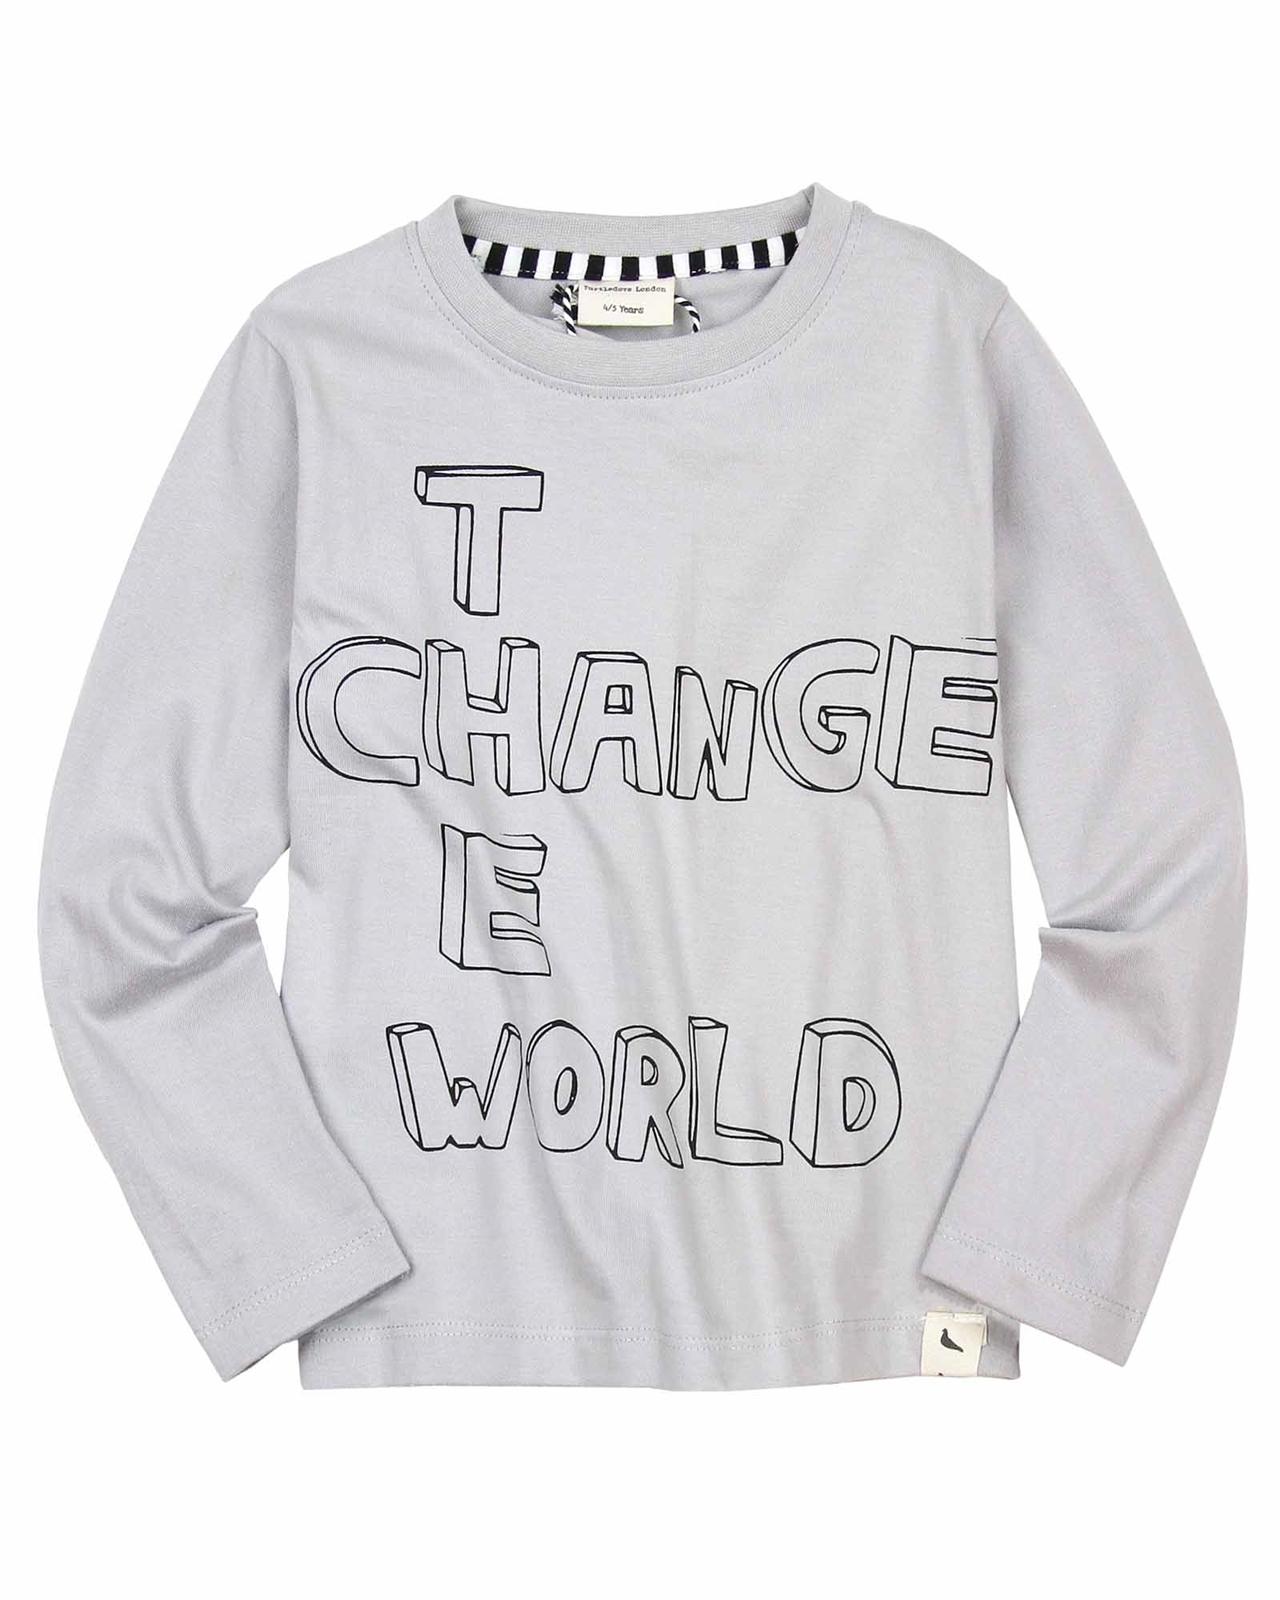 839cd9e41 Turtledove London Change the World T-shirt - Turtledove London ...